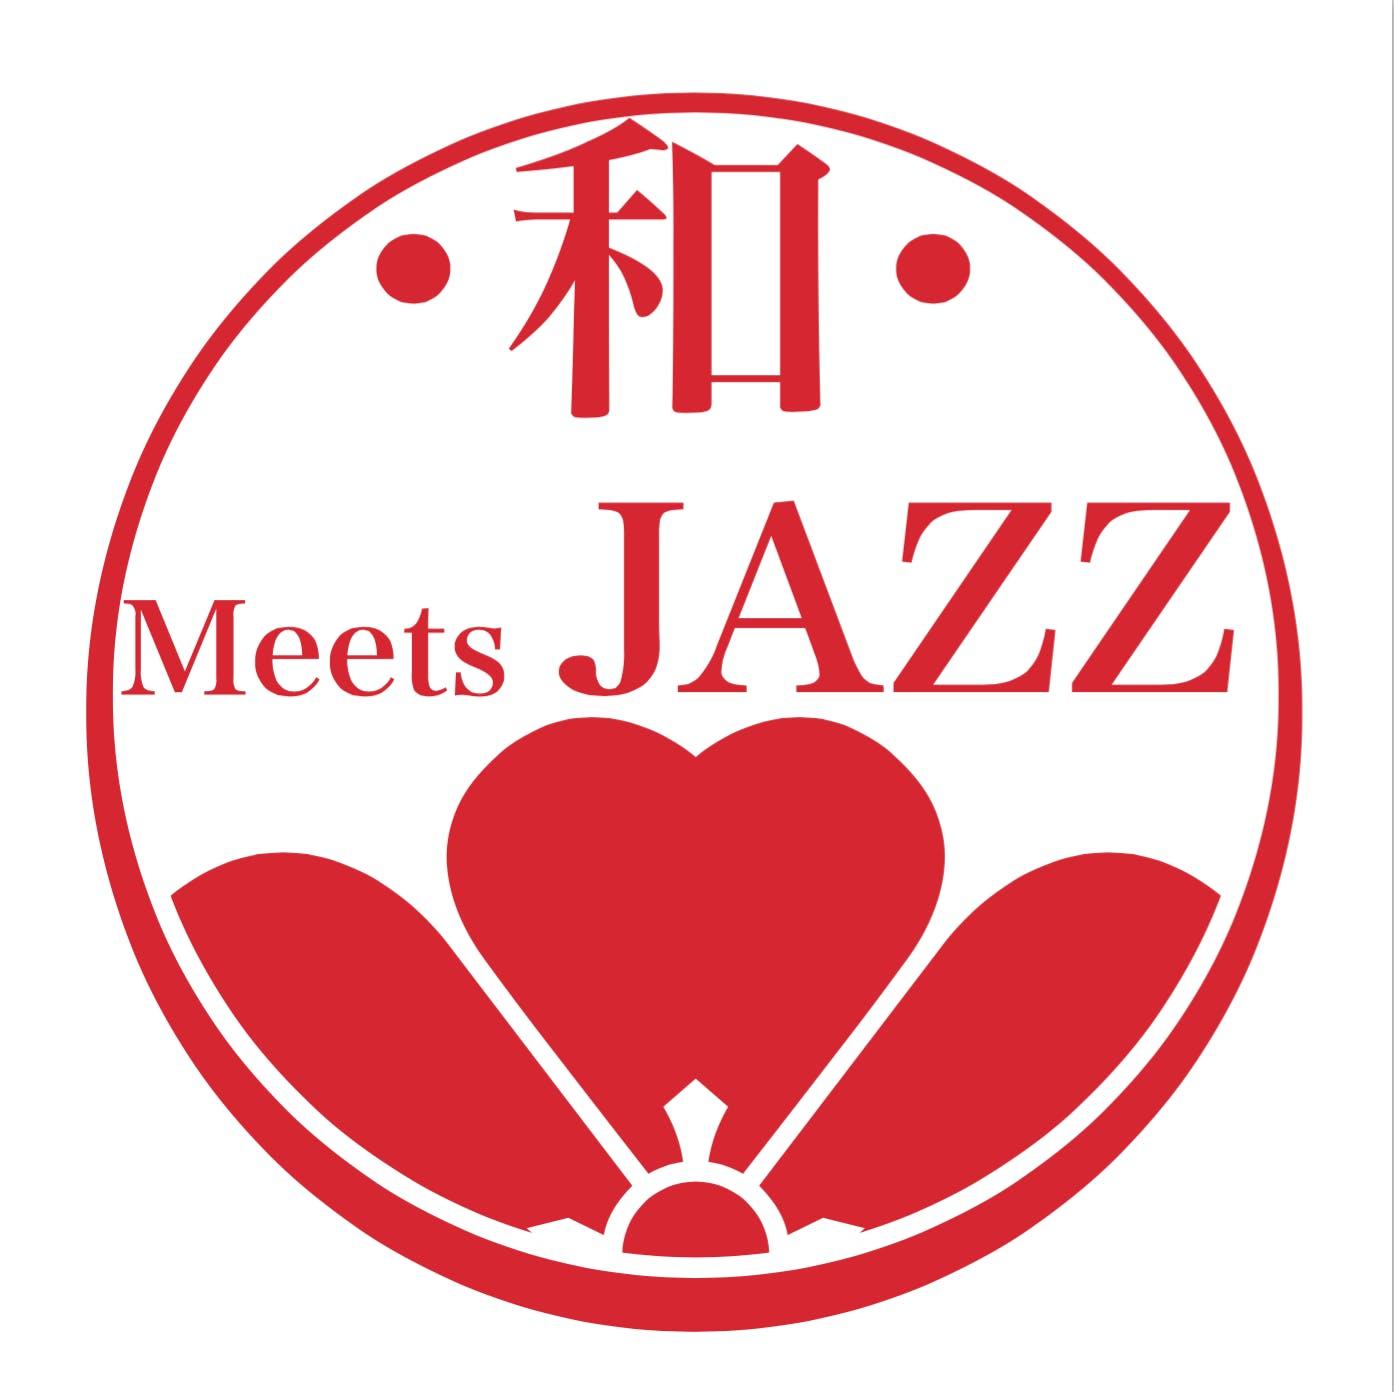 和.meets.jazz家紋.2017.01.16